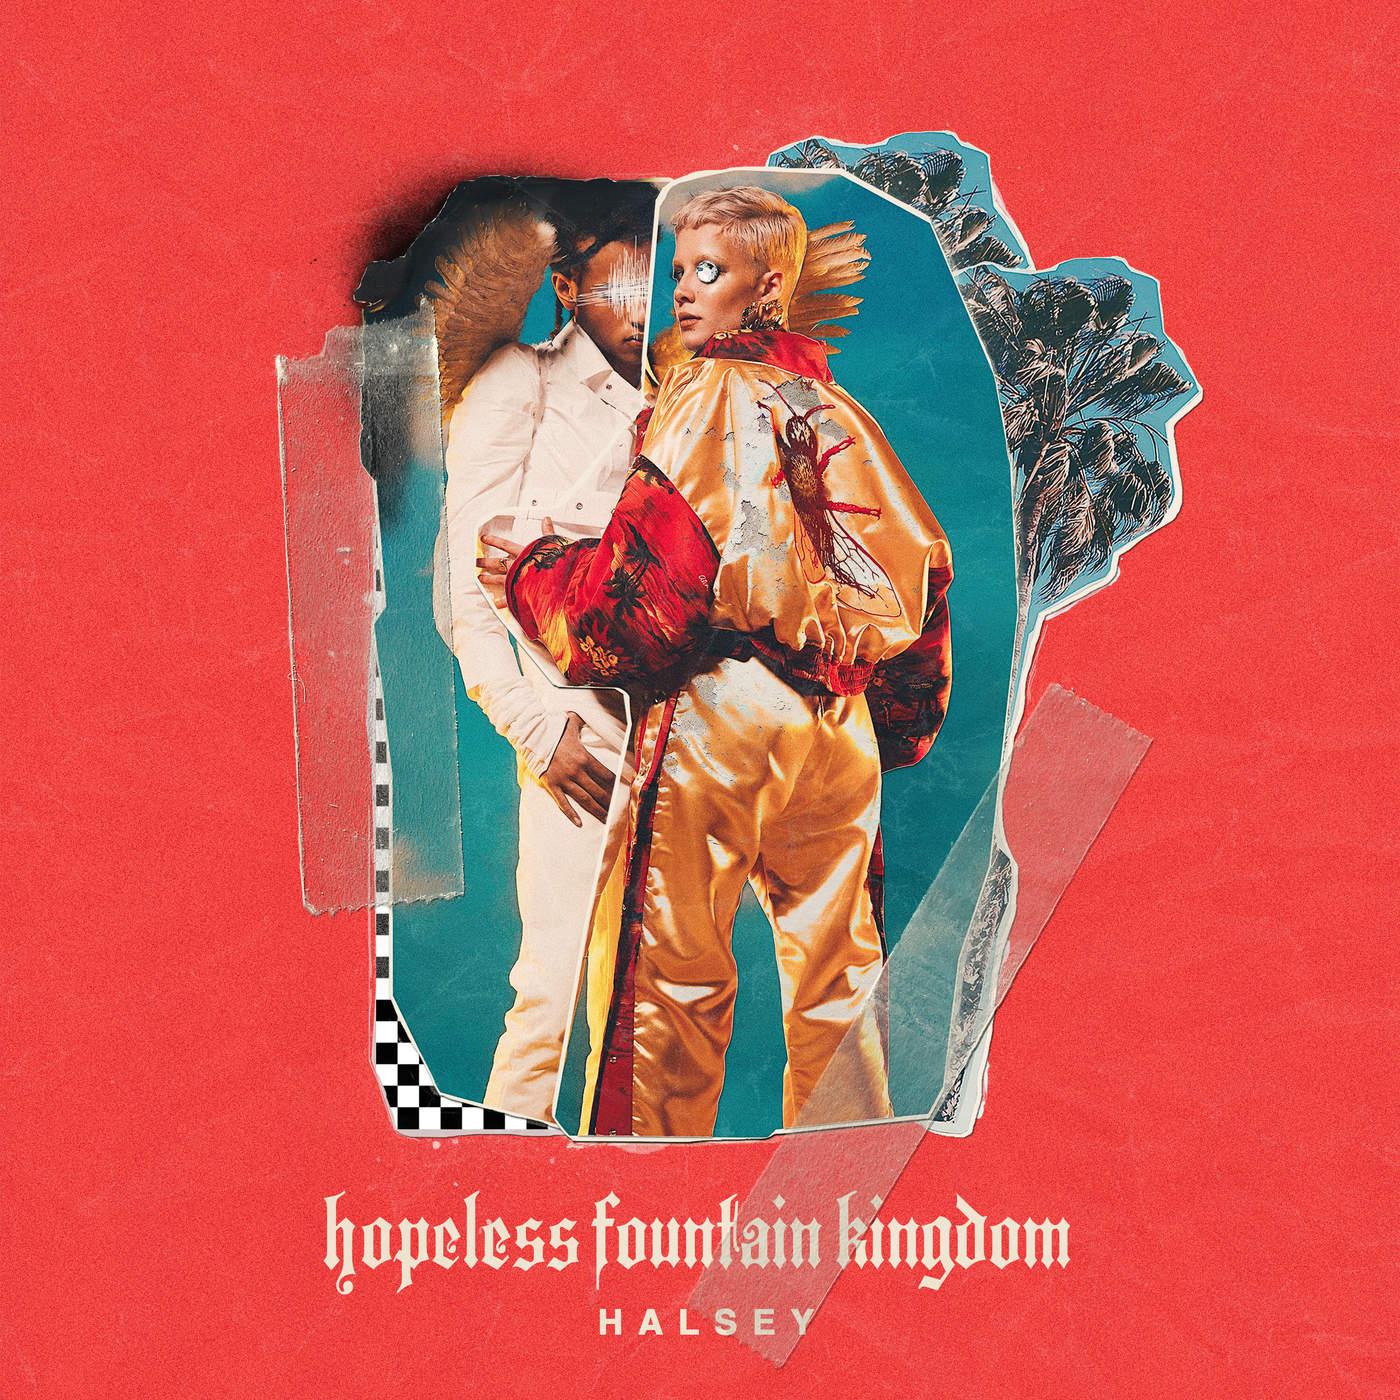 Halsey - hopeless fountain kingdom (Deluxe) Cover